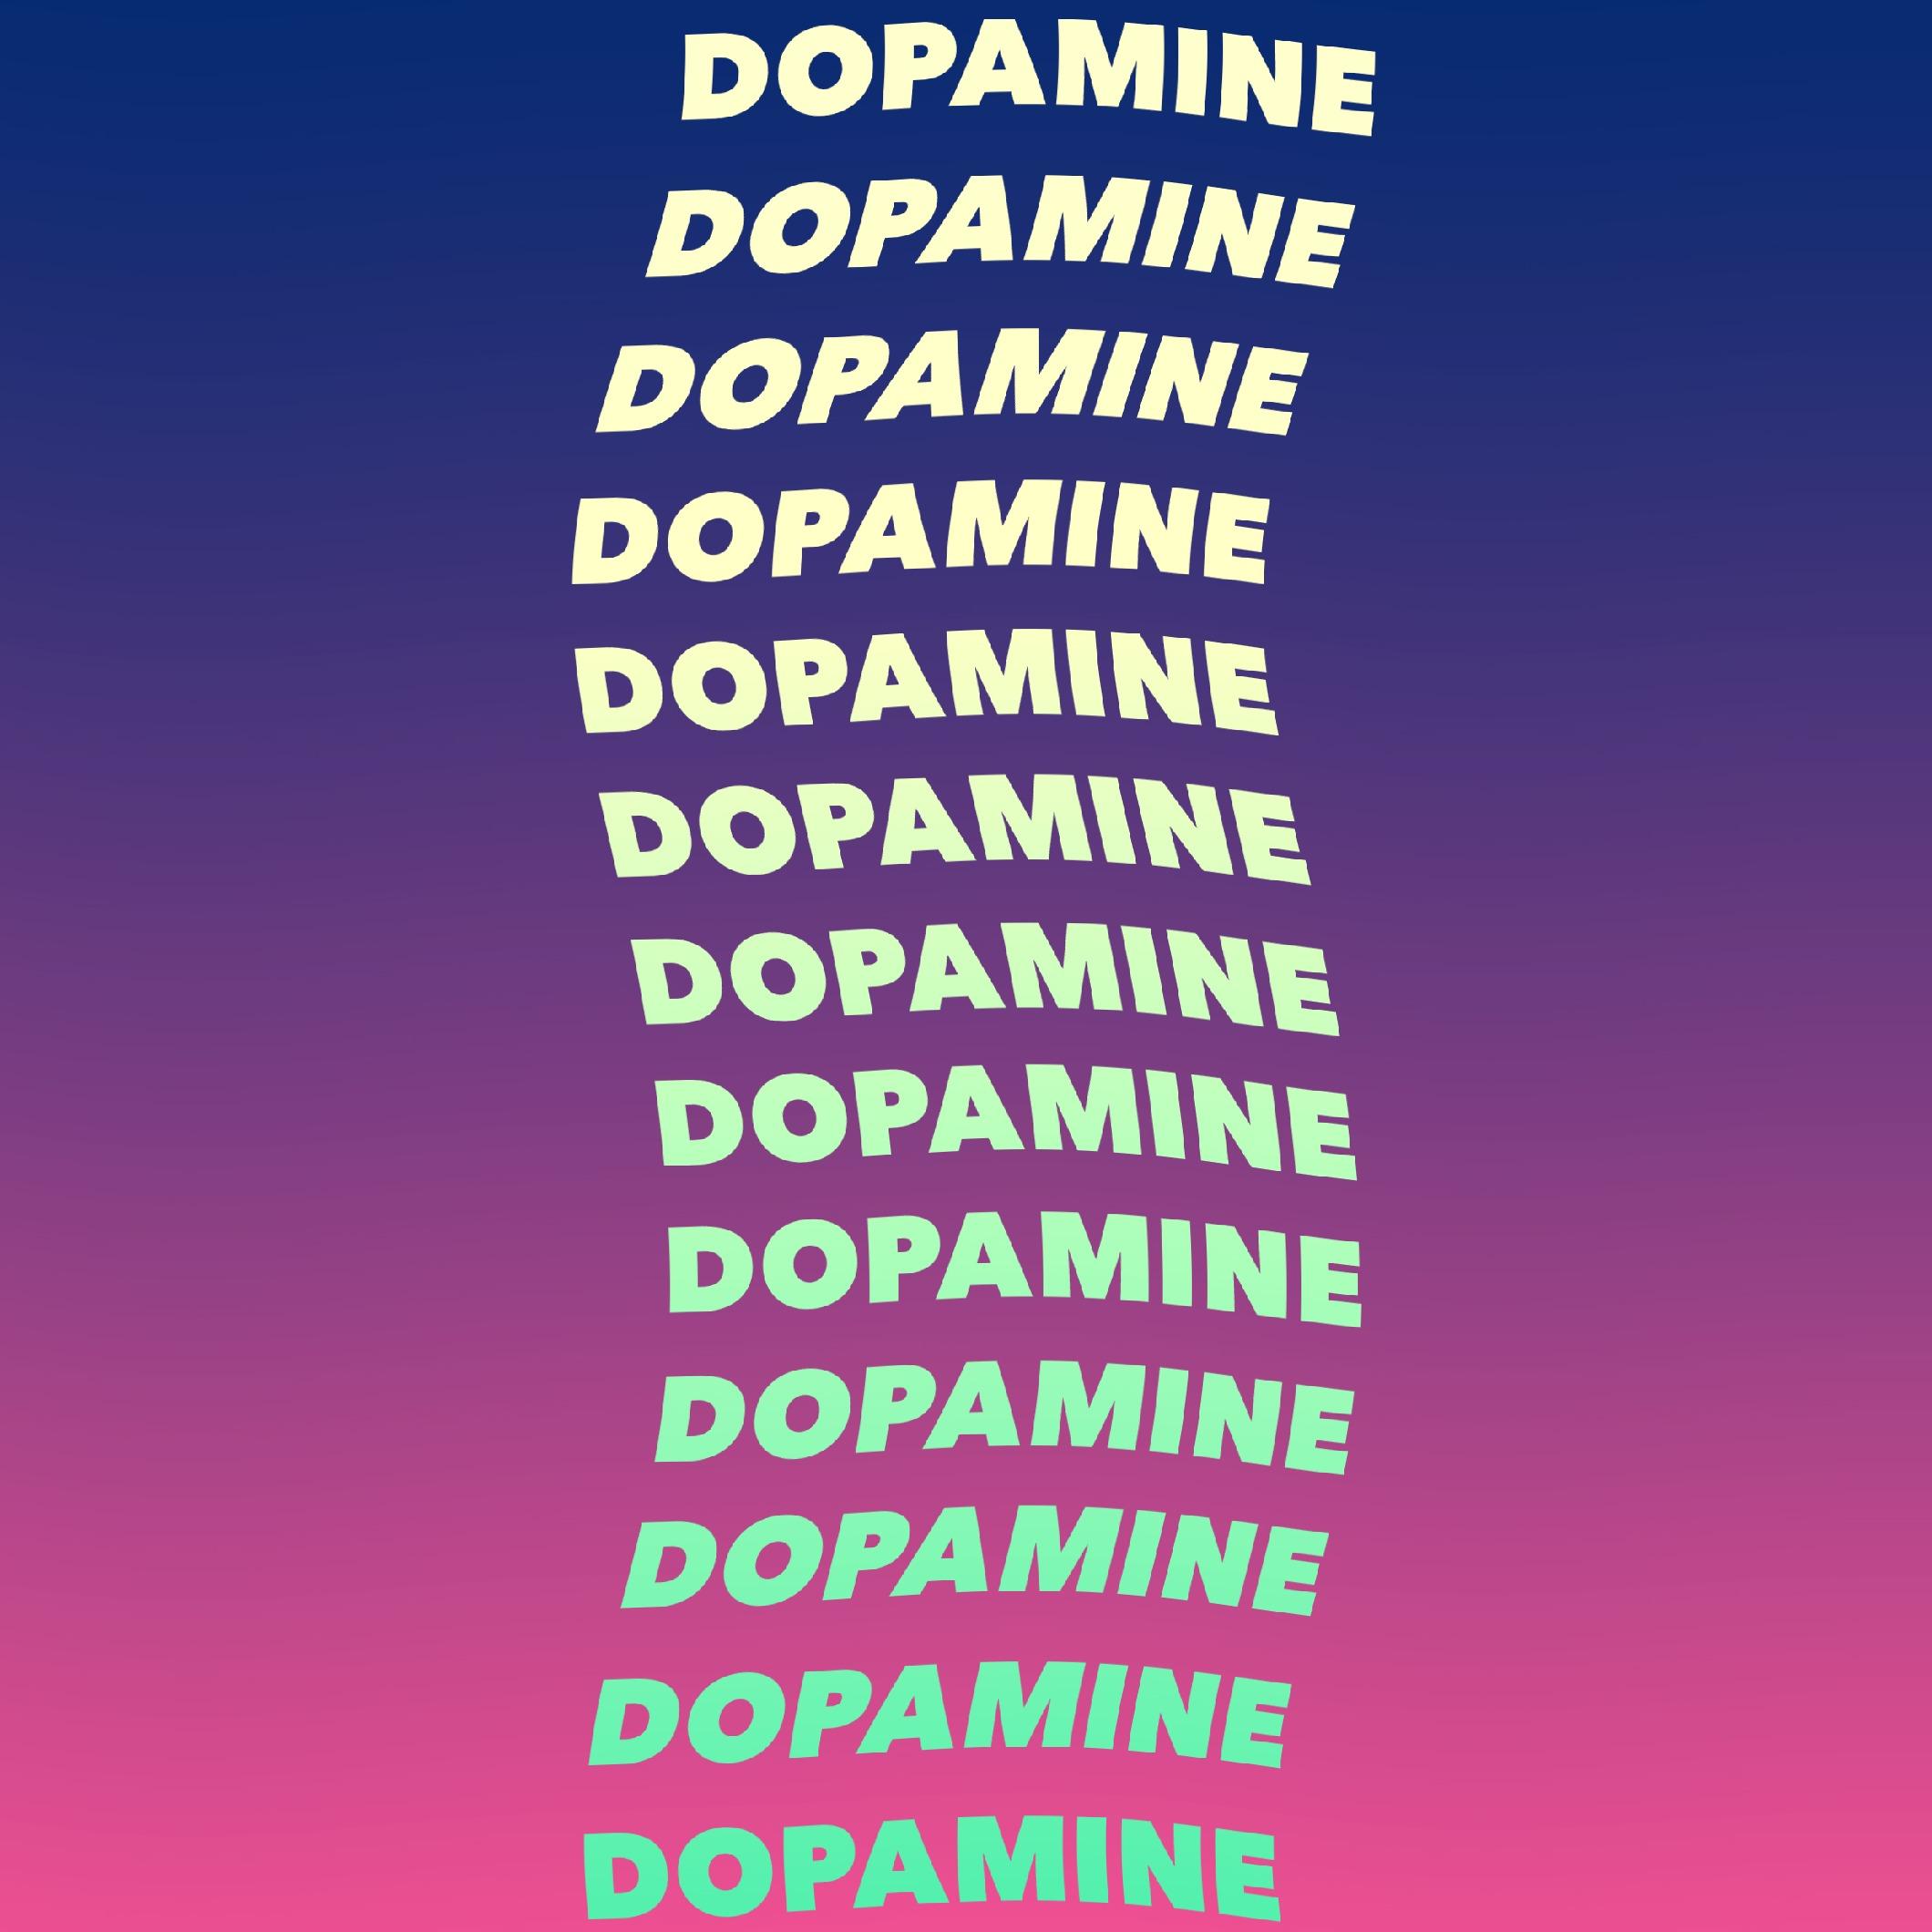 DOPAMINE poster_edited